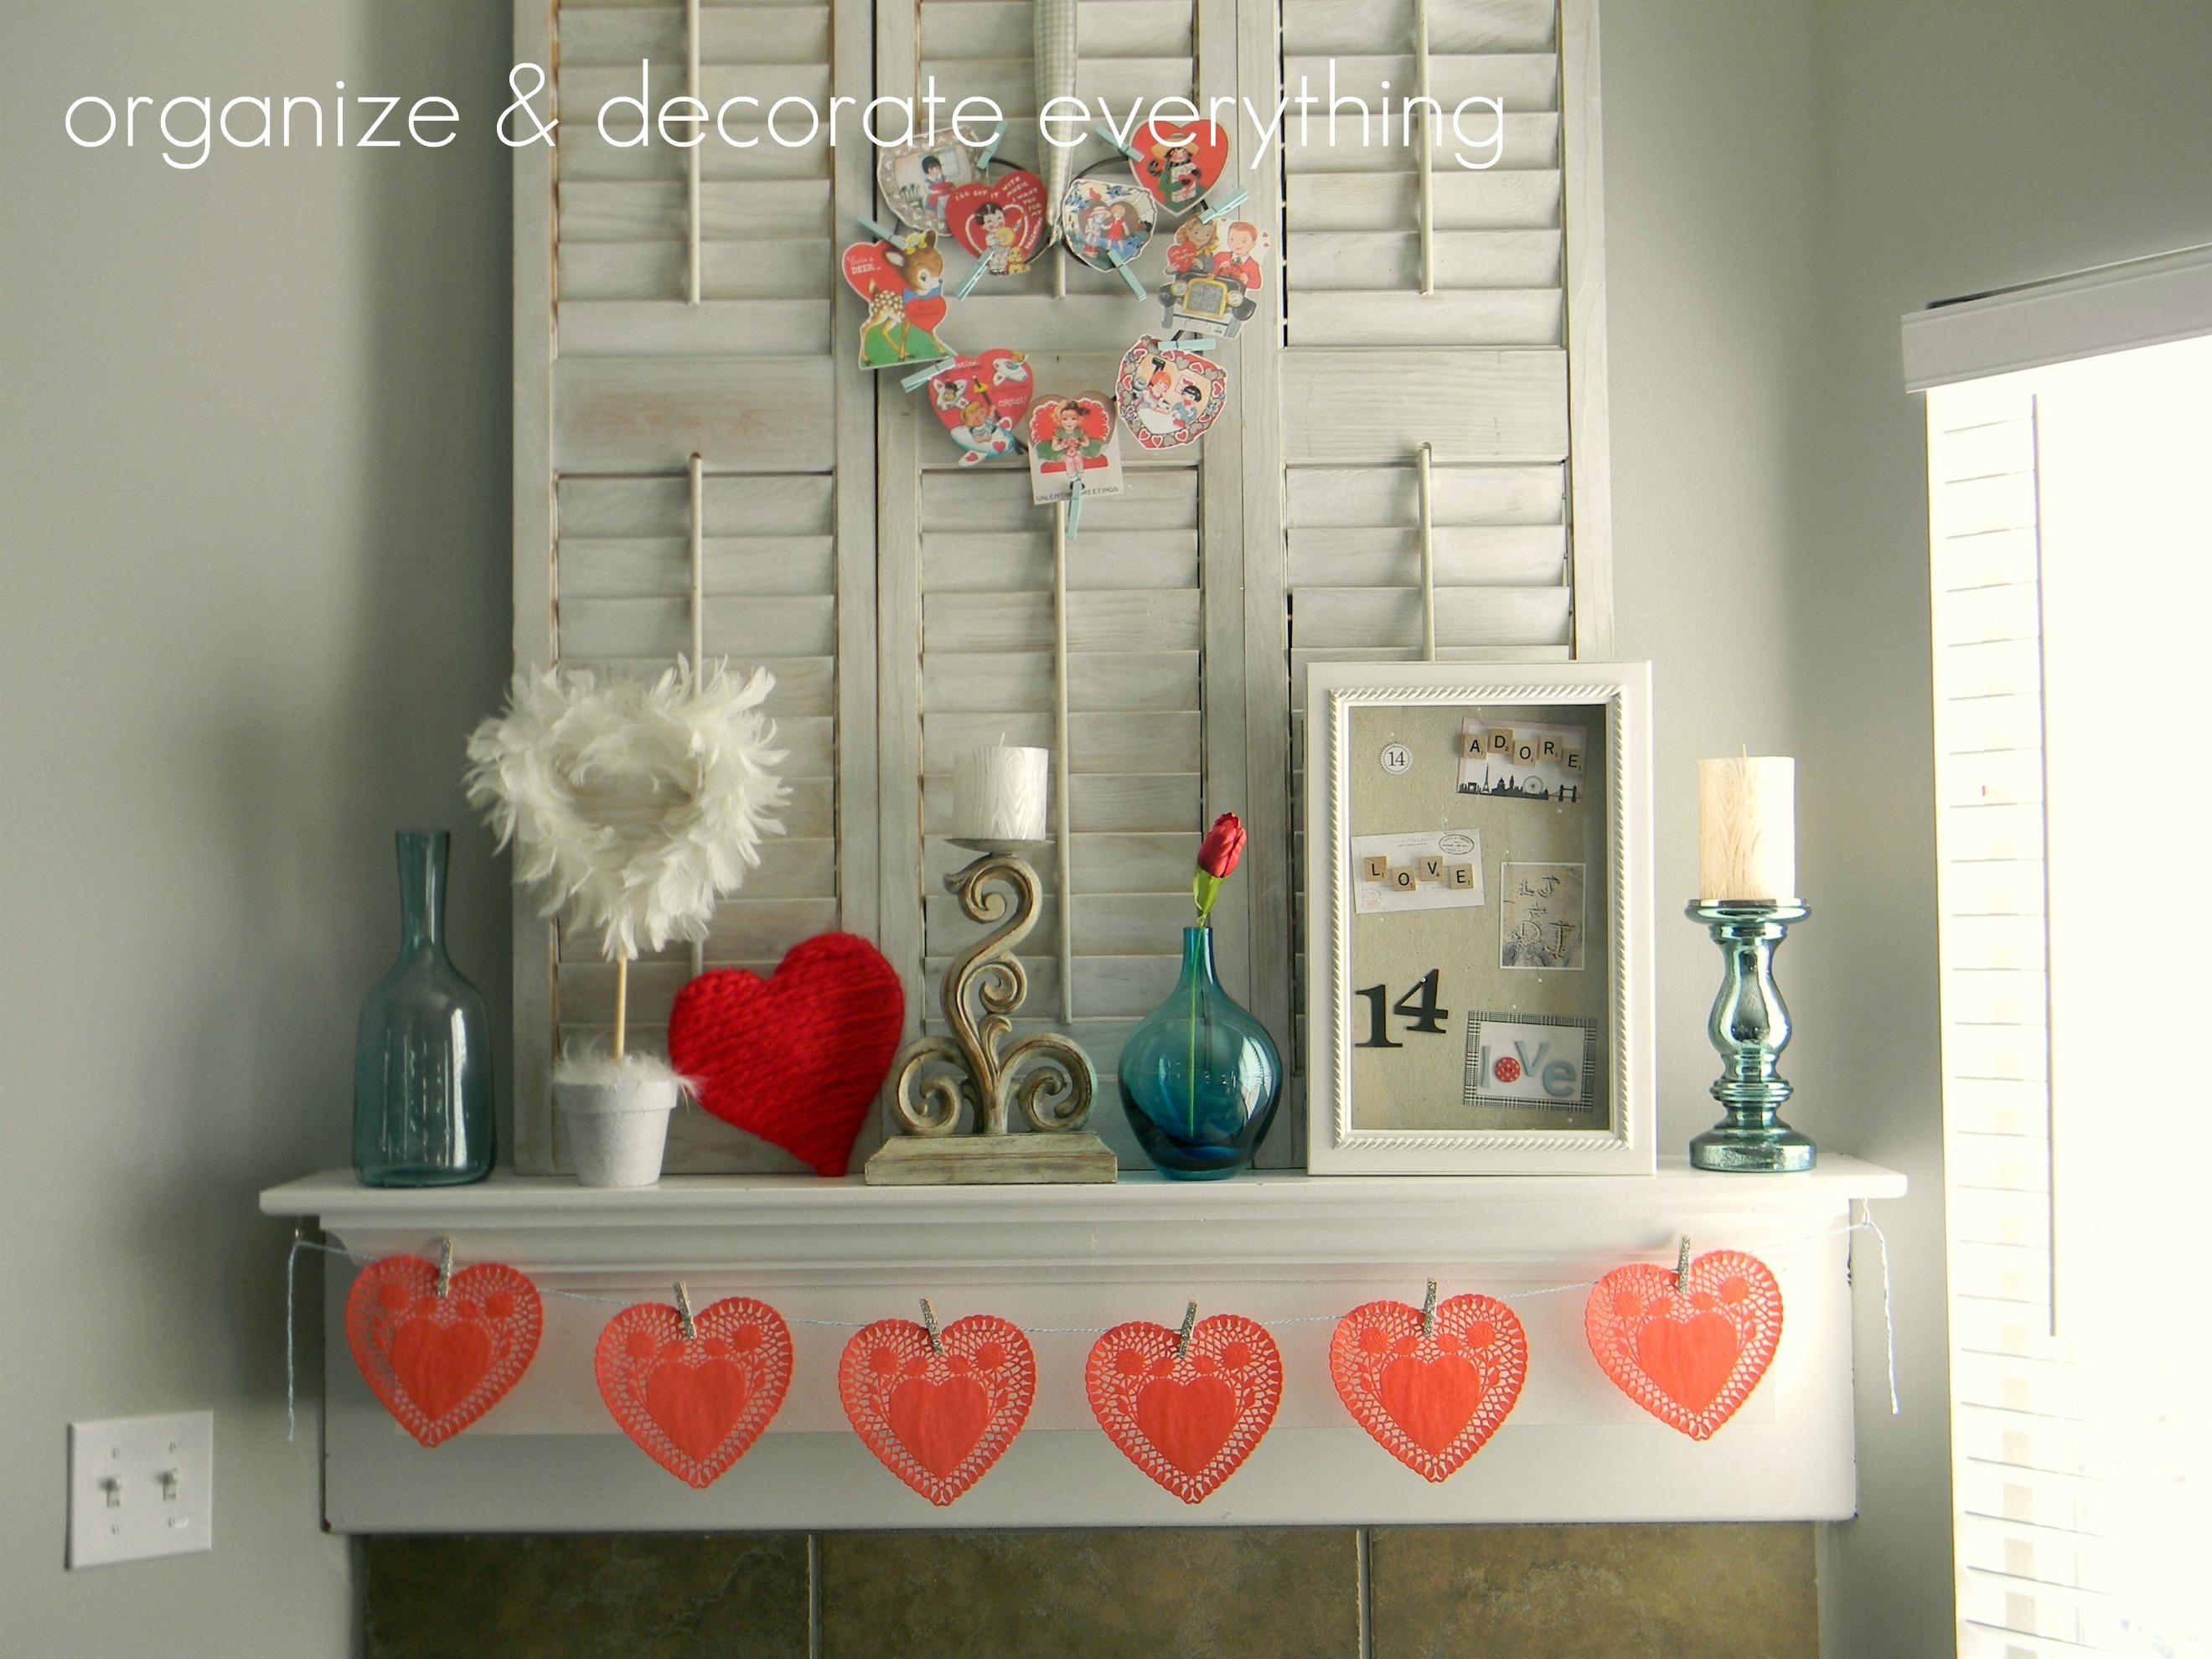 http://organizeyourstuffnow.com/wordpress/wp-content/uploads/2012/02/Valentines-Day-Manteltext2.jpg